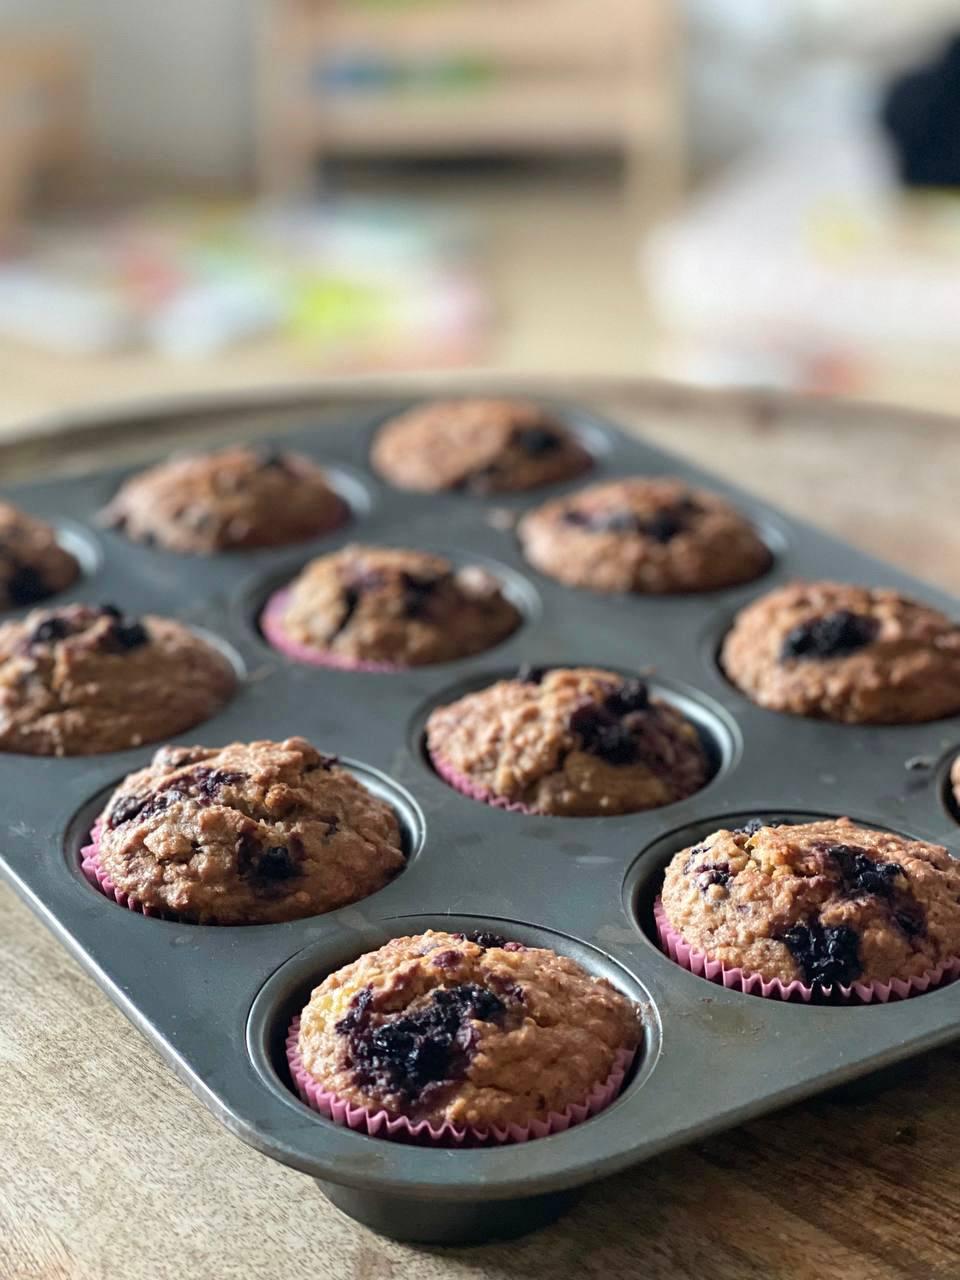 Receta de muffins saludables